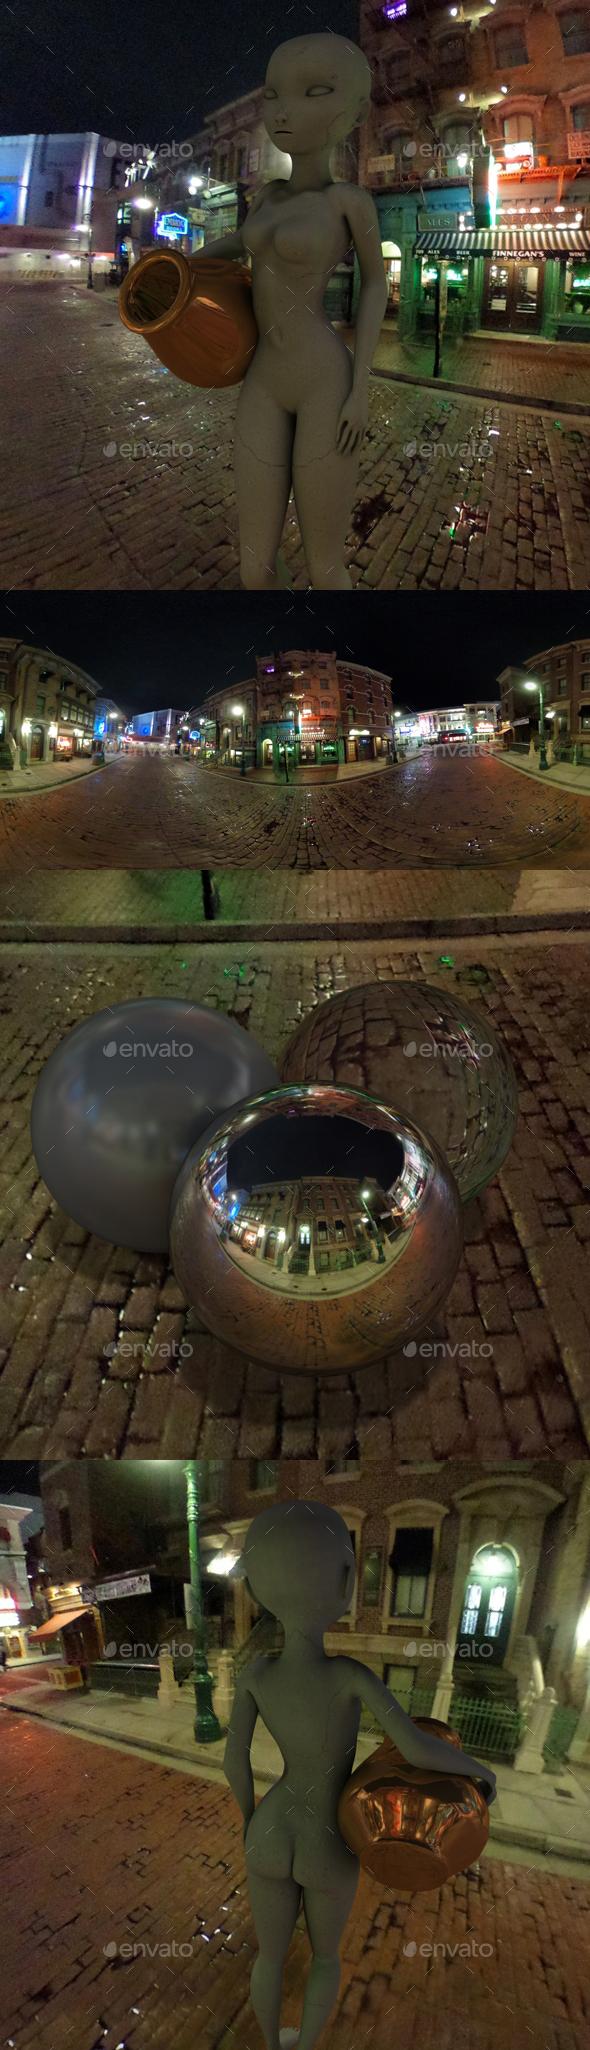 Nighttime Old New York Street HDRI - 3DOcean Item for Sale